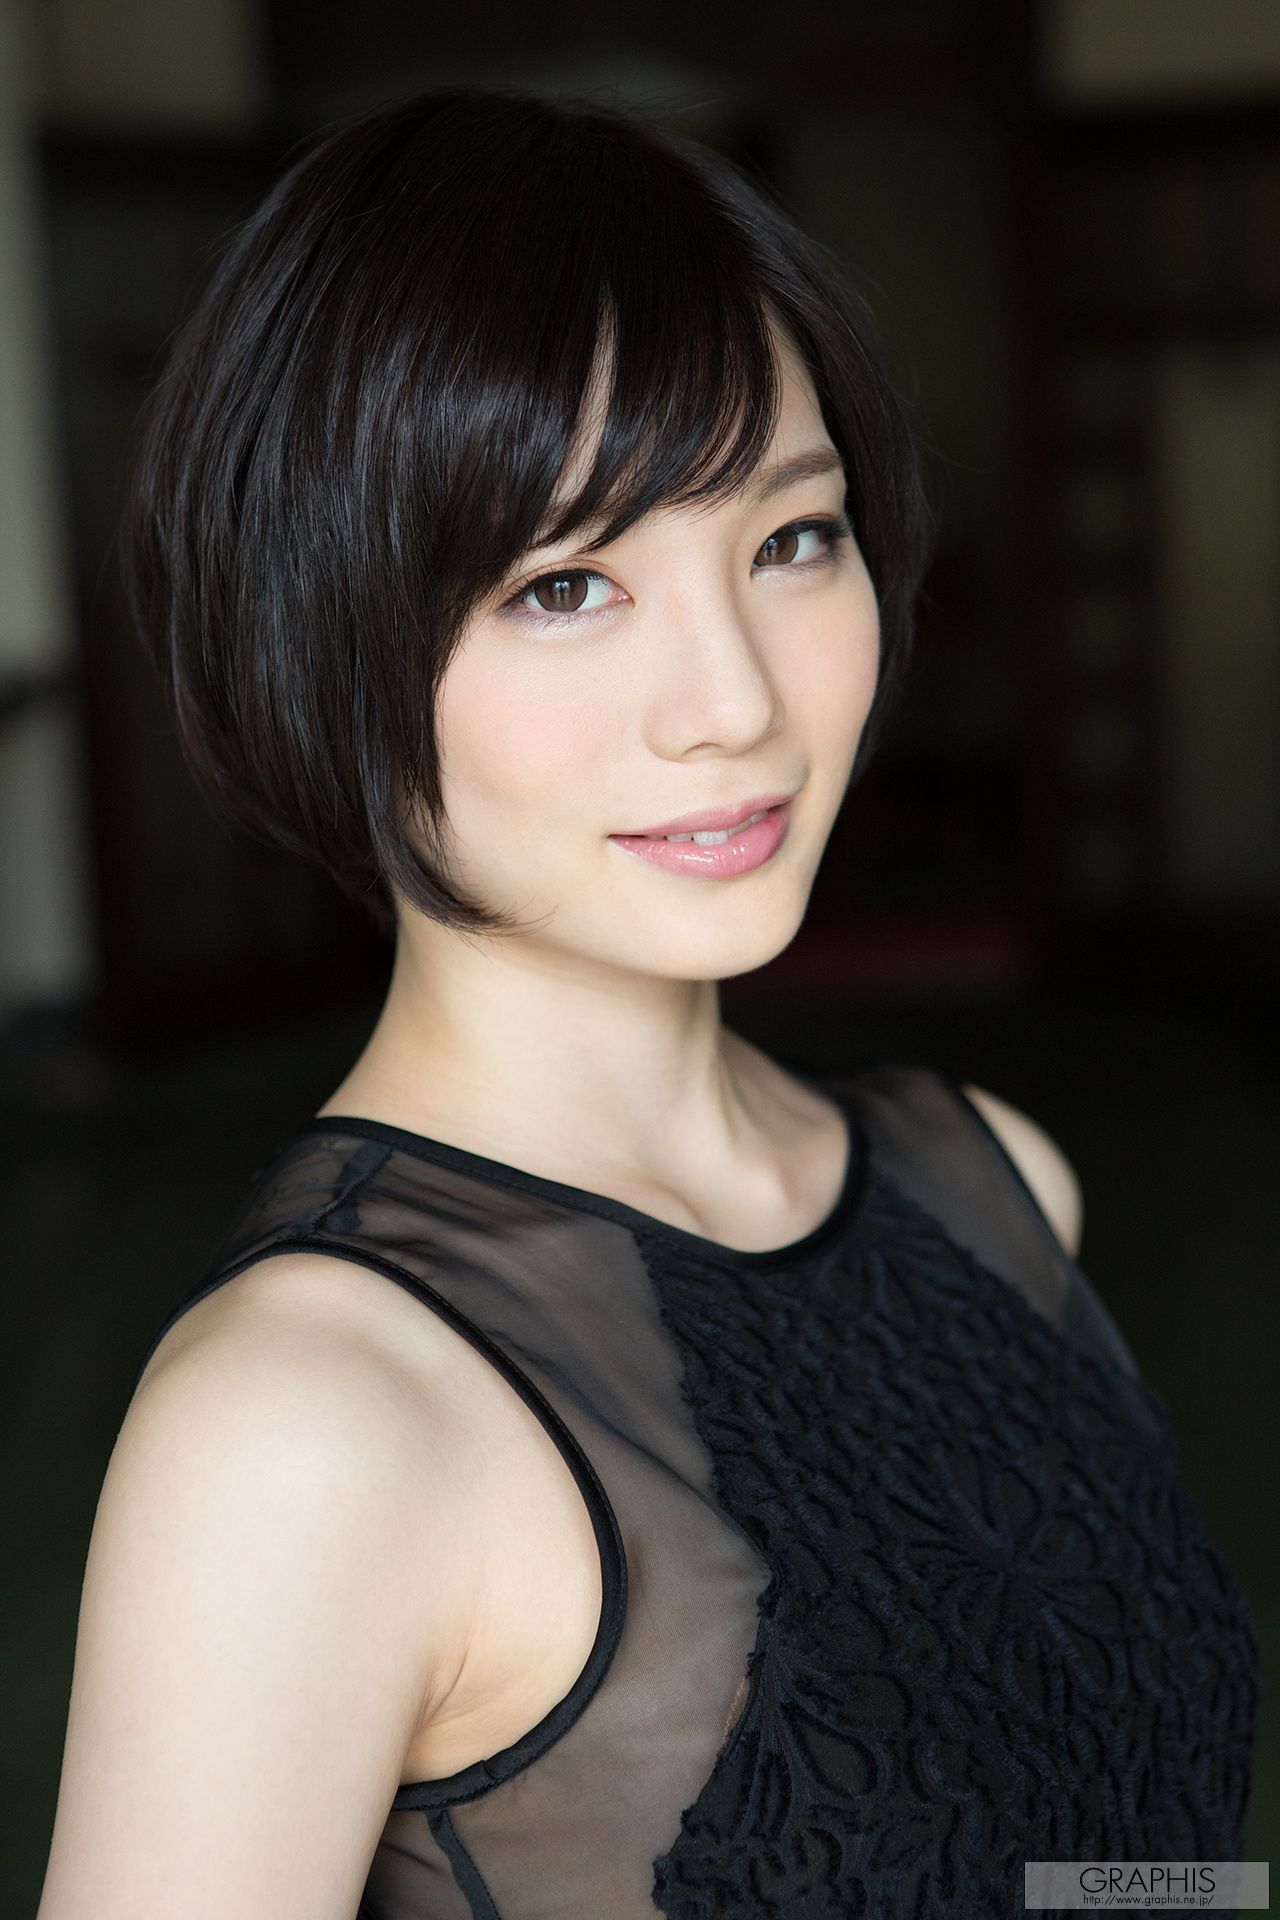 VOL.986 [Graphis]女艺人轻熟女:铃村爱里(鈴村あいり)超高清写真套图(64P)